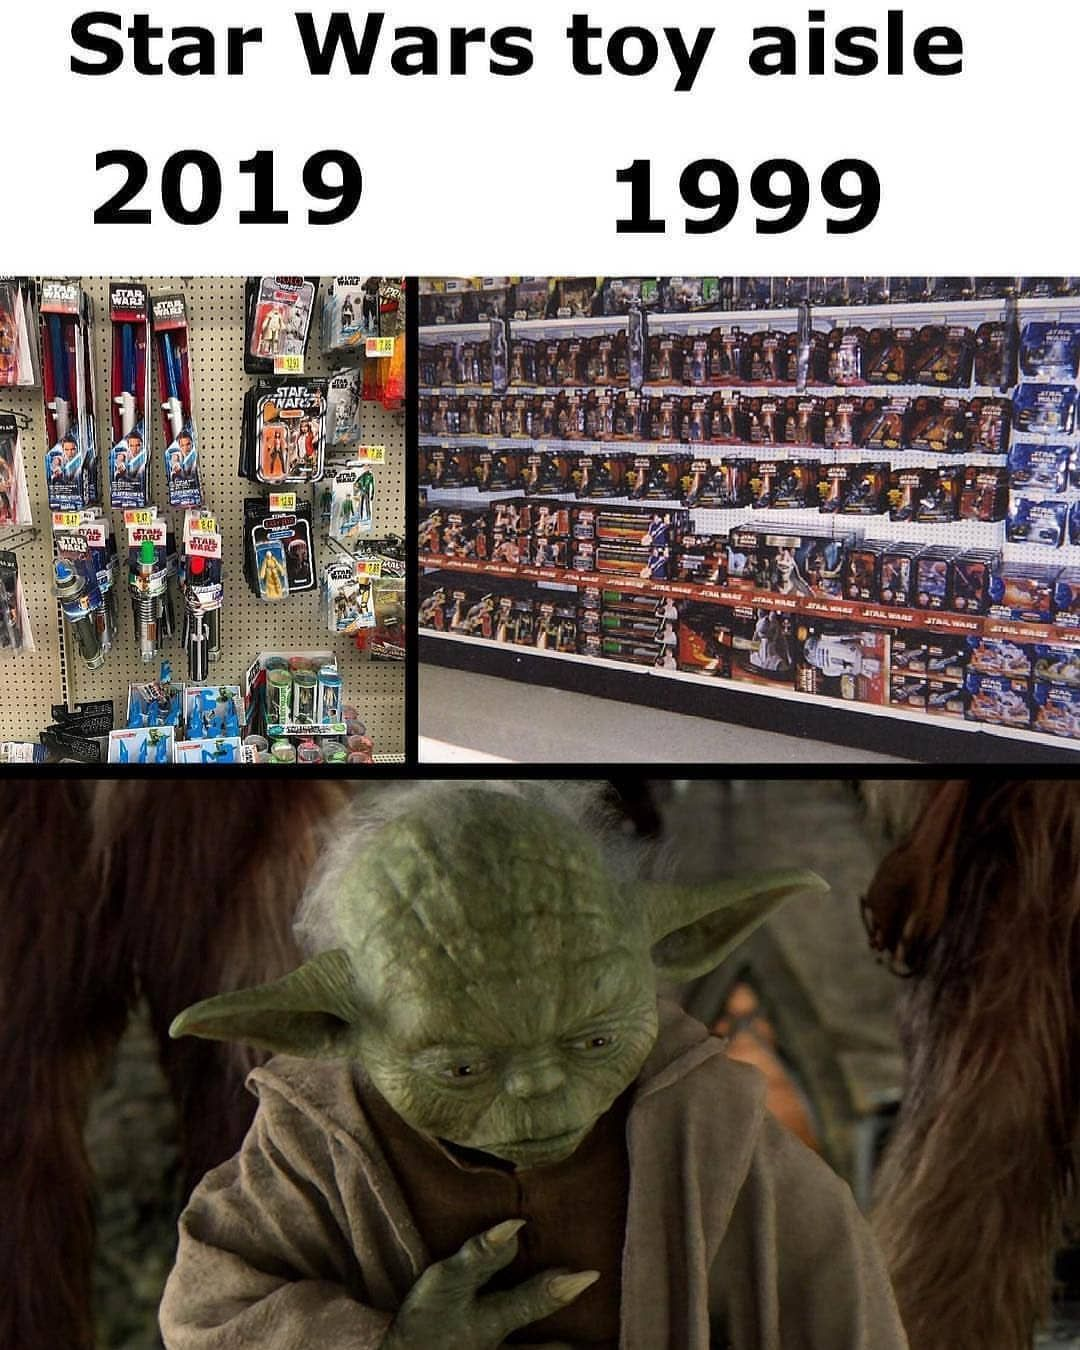 Pin On Mads Star Wars Board